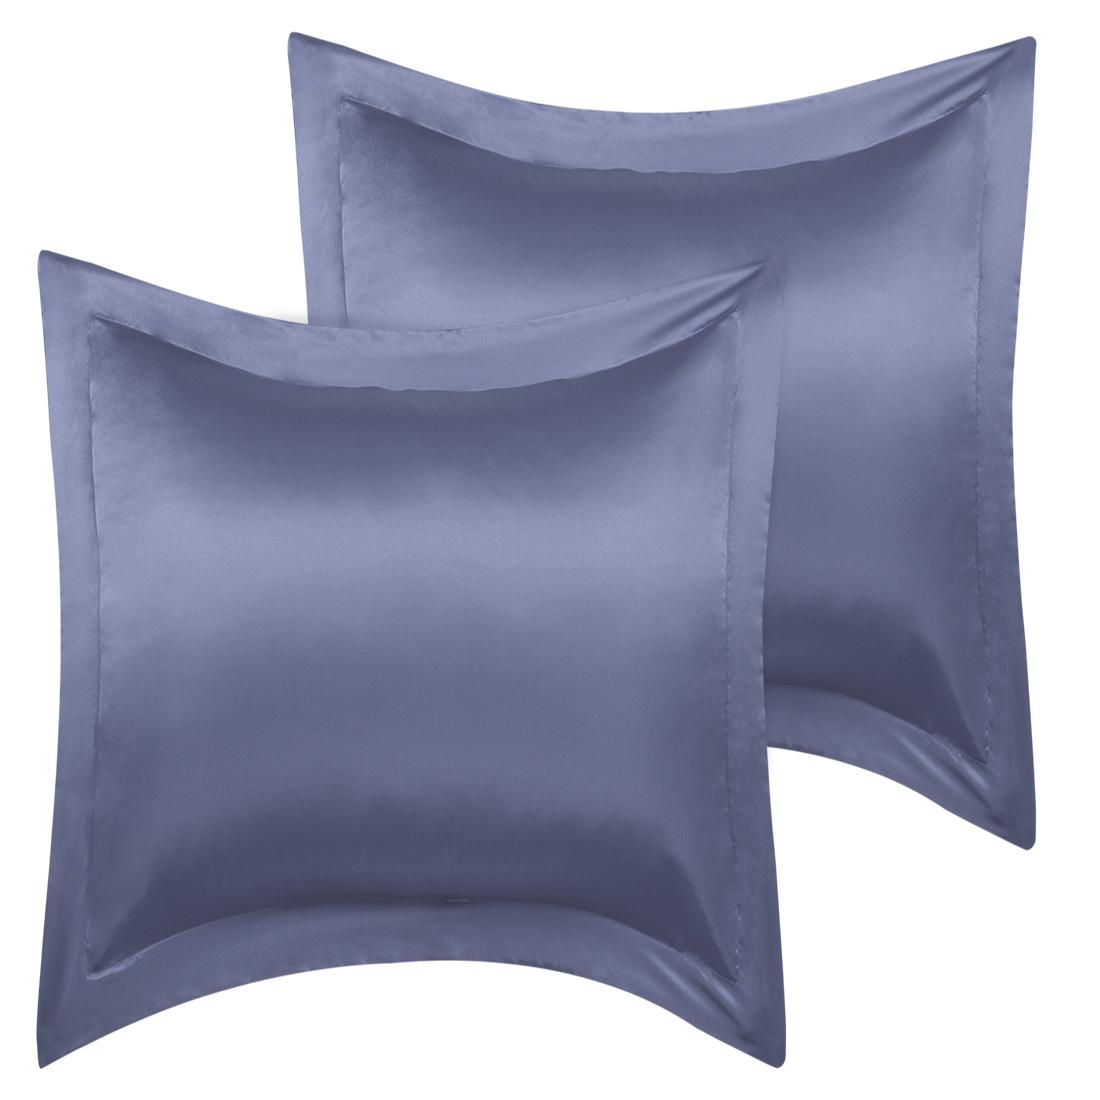 2 Pcs Slate Gray Pillow Shams Satin Pillow Cases European Oxford Pillowcases